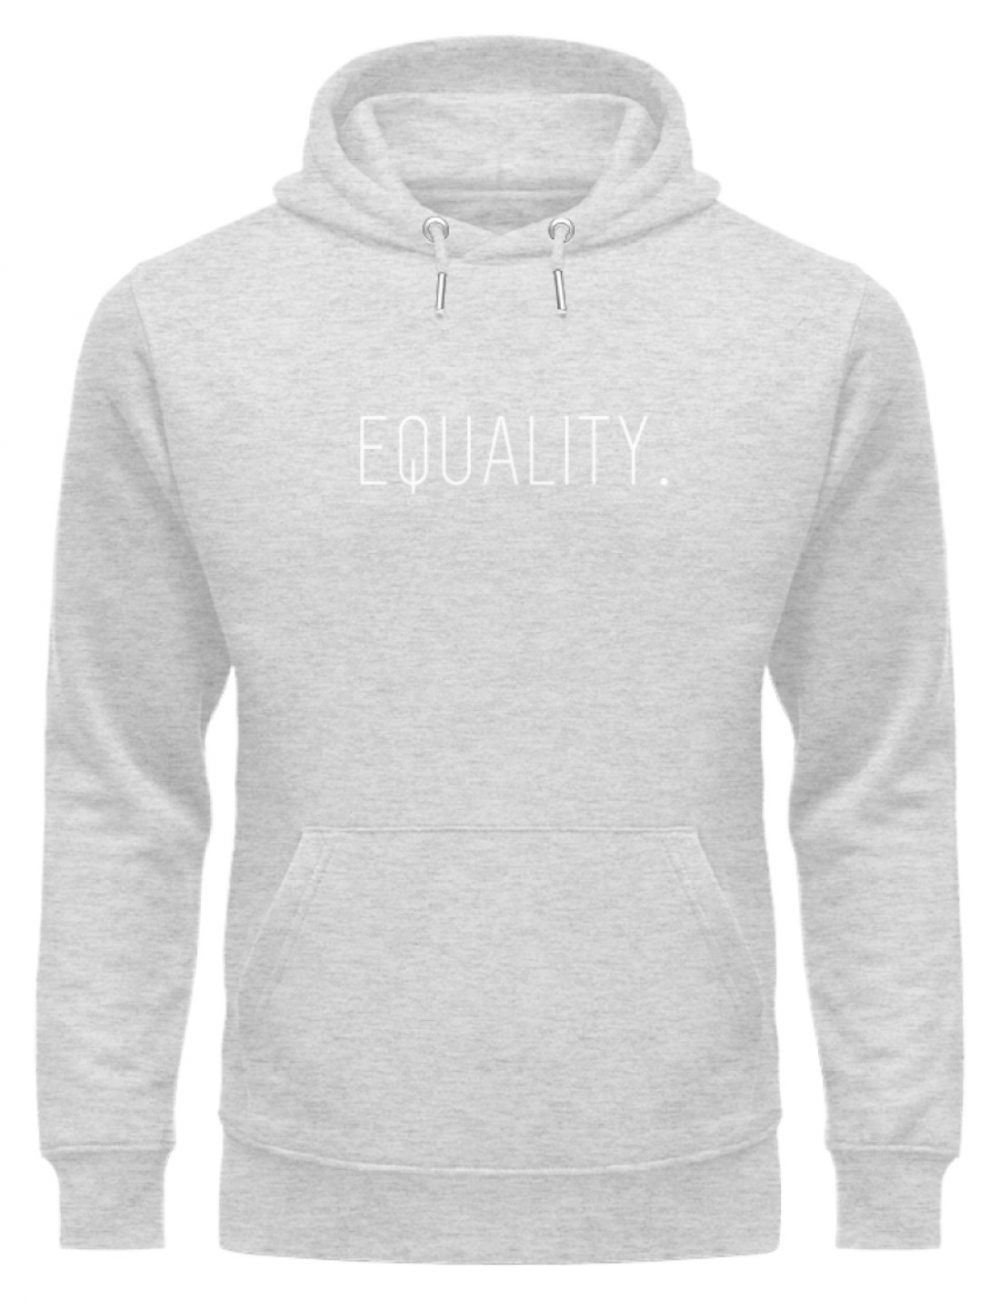 EQUALITY. - Unisex Organic Hoodie-6892